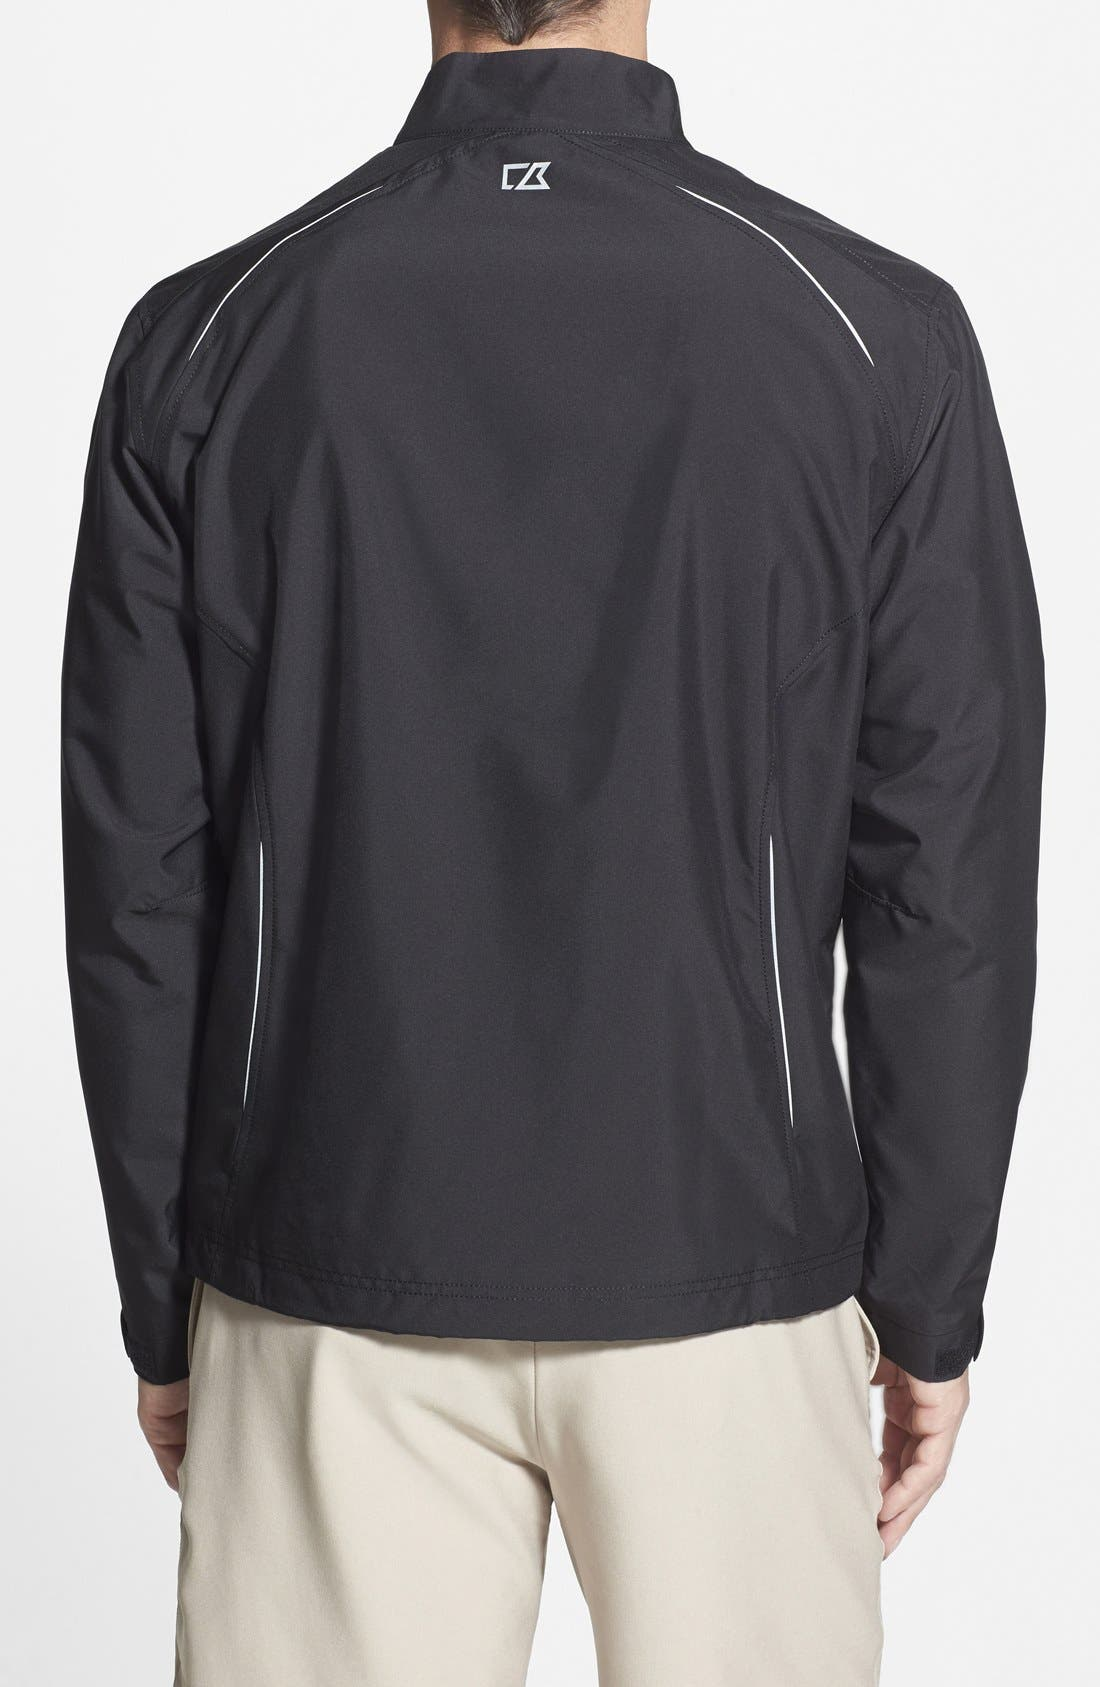 New Orleans Saints - Beacon WeatherTec Wind & Water Resistant Jacket,                             Alternate thumbnail 2, color,                             Black